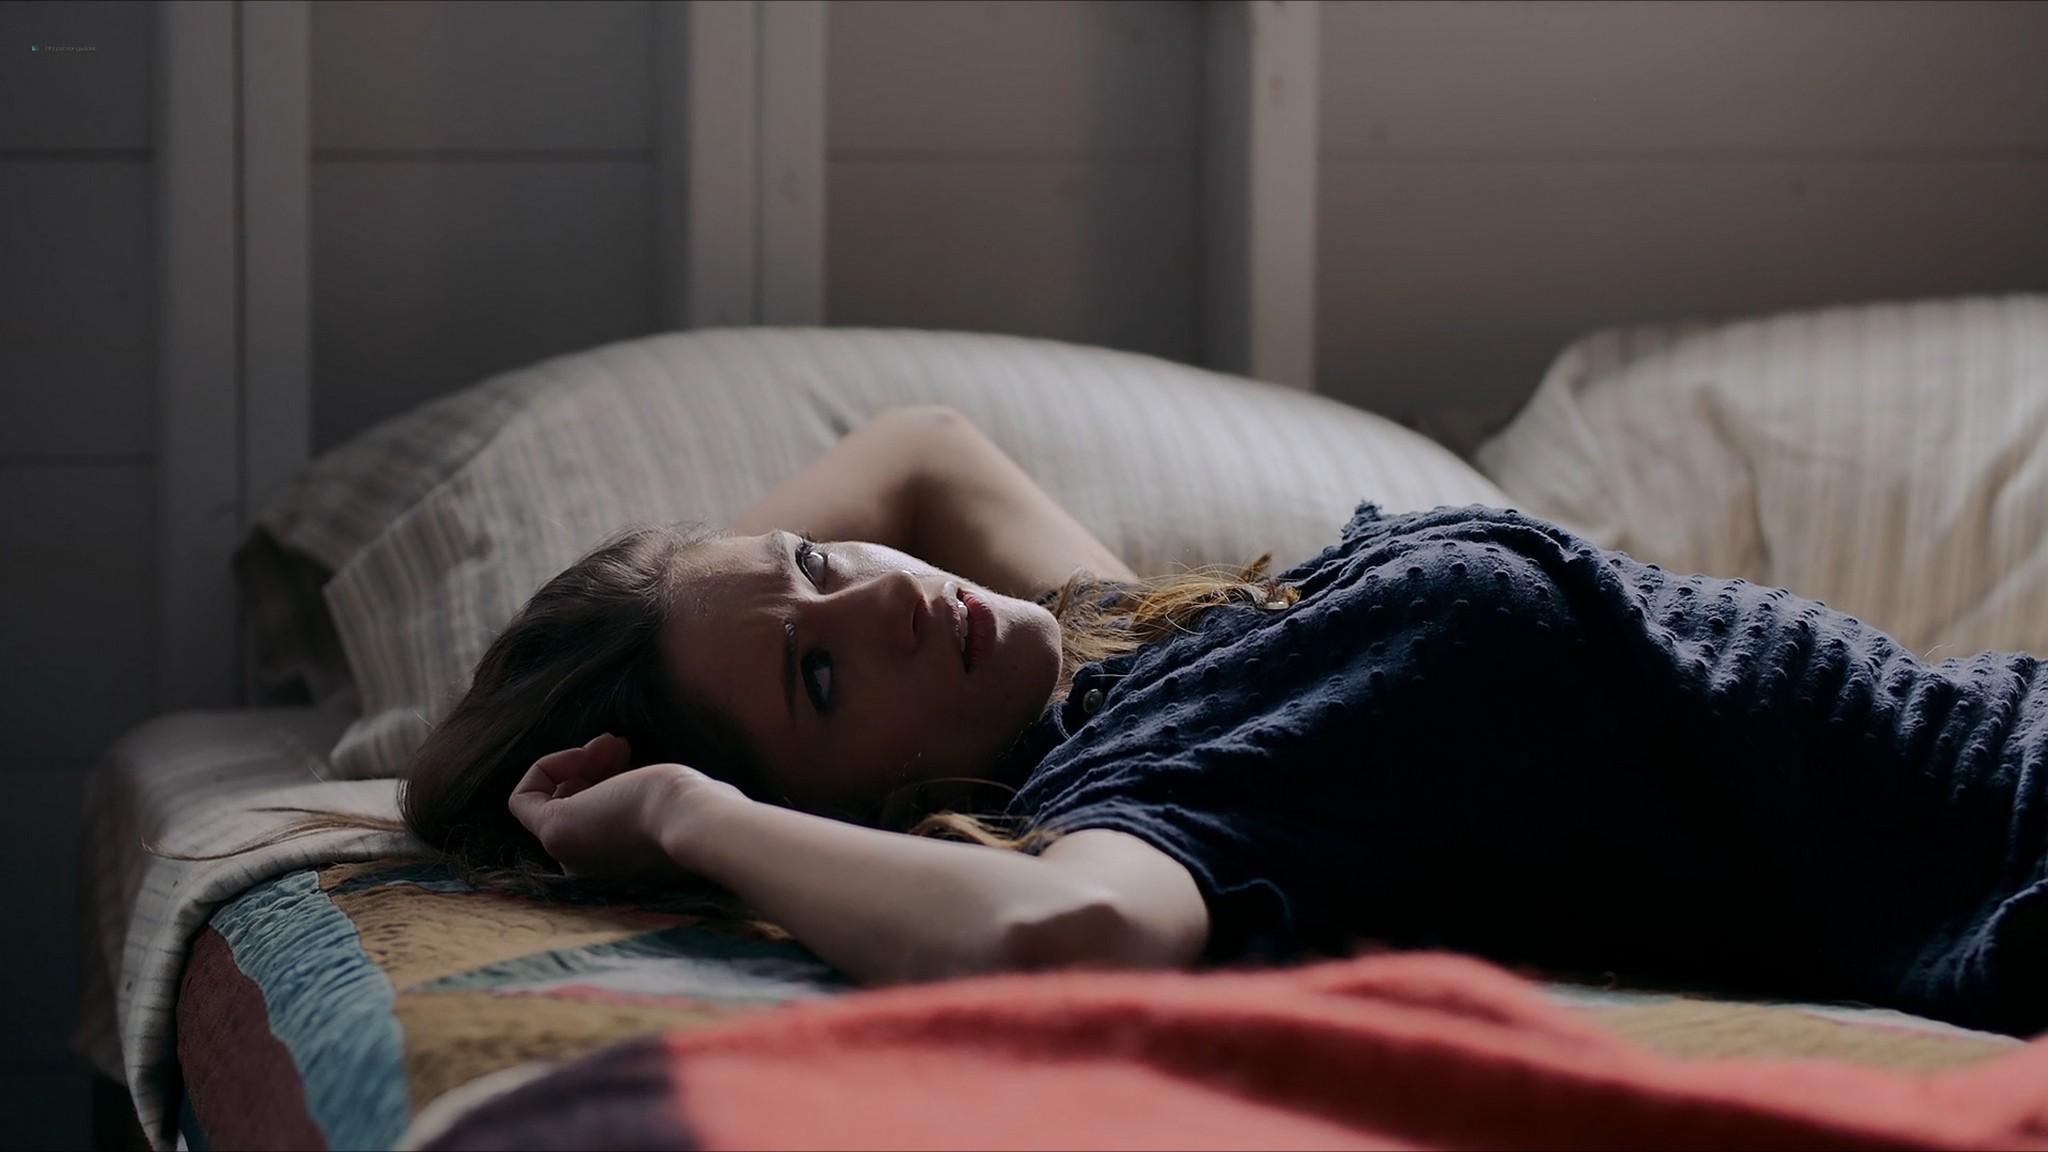 Amanda Seyfried hot Natalia Dyer sexy Things Heard Seen 2021 1080p Web 13